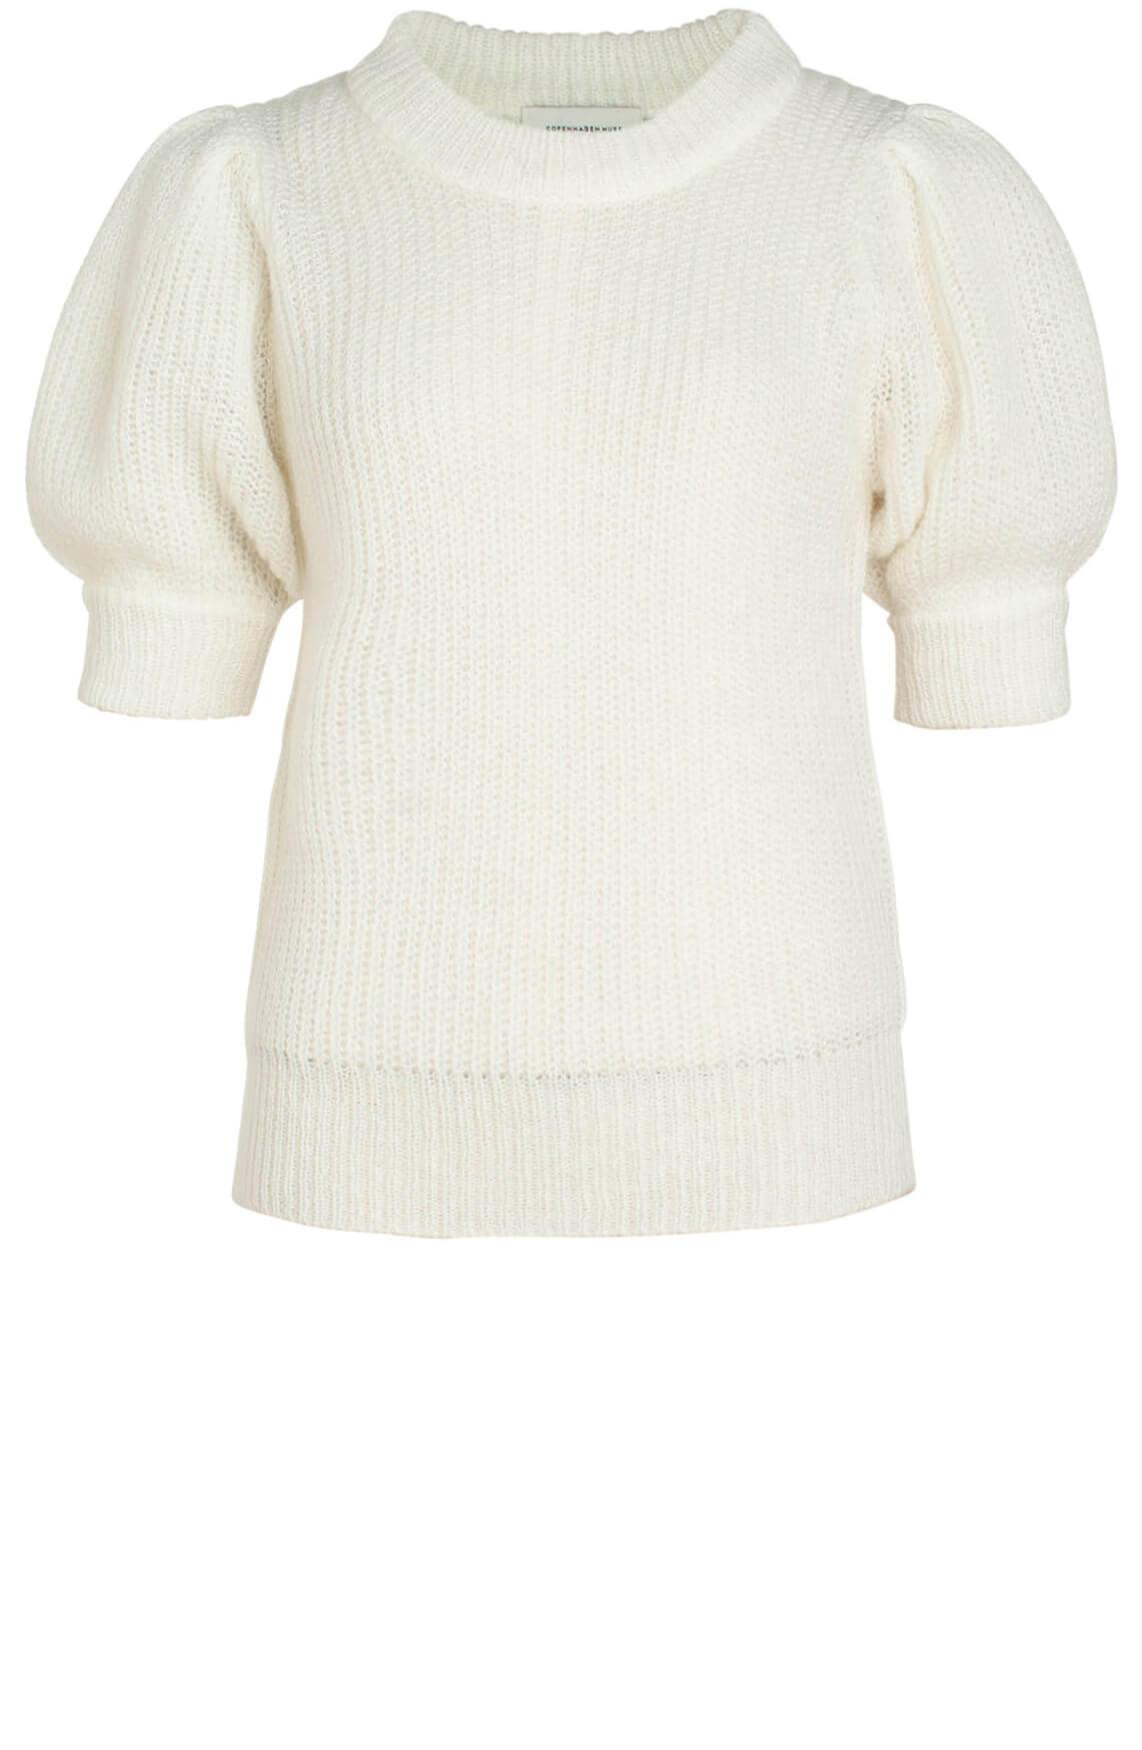 Copenhagen Muse Dames Gebreide pullover wit